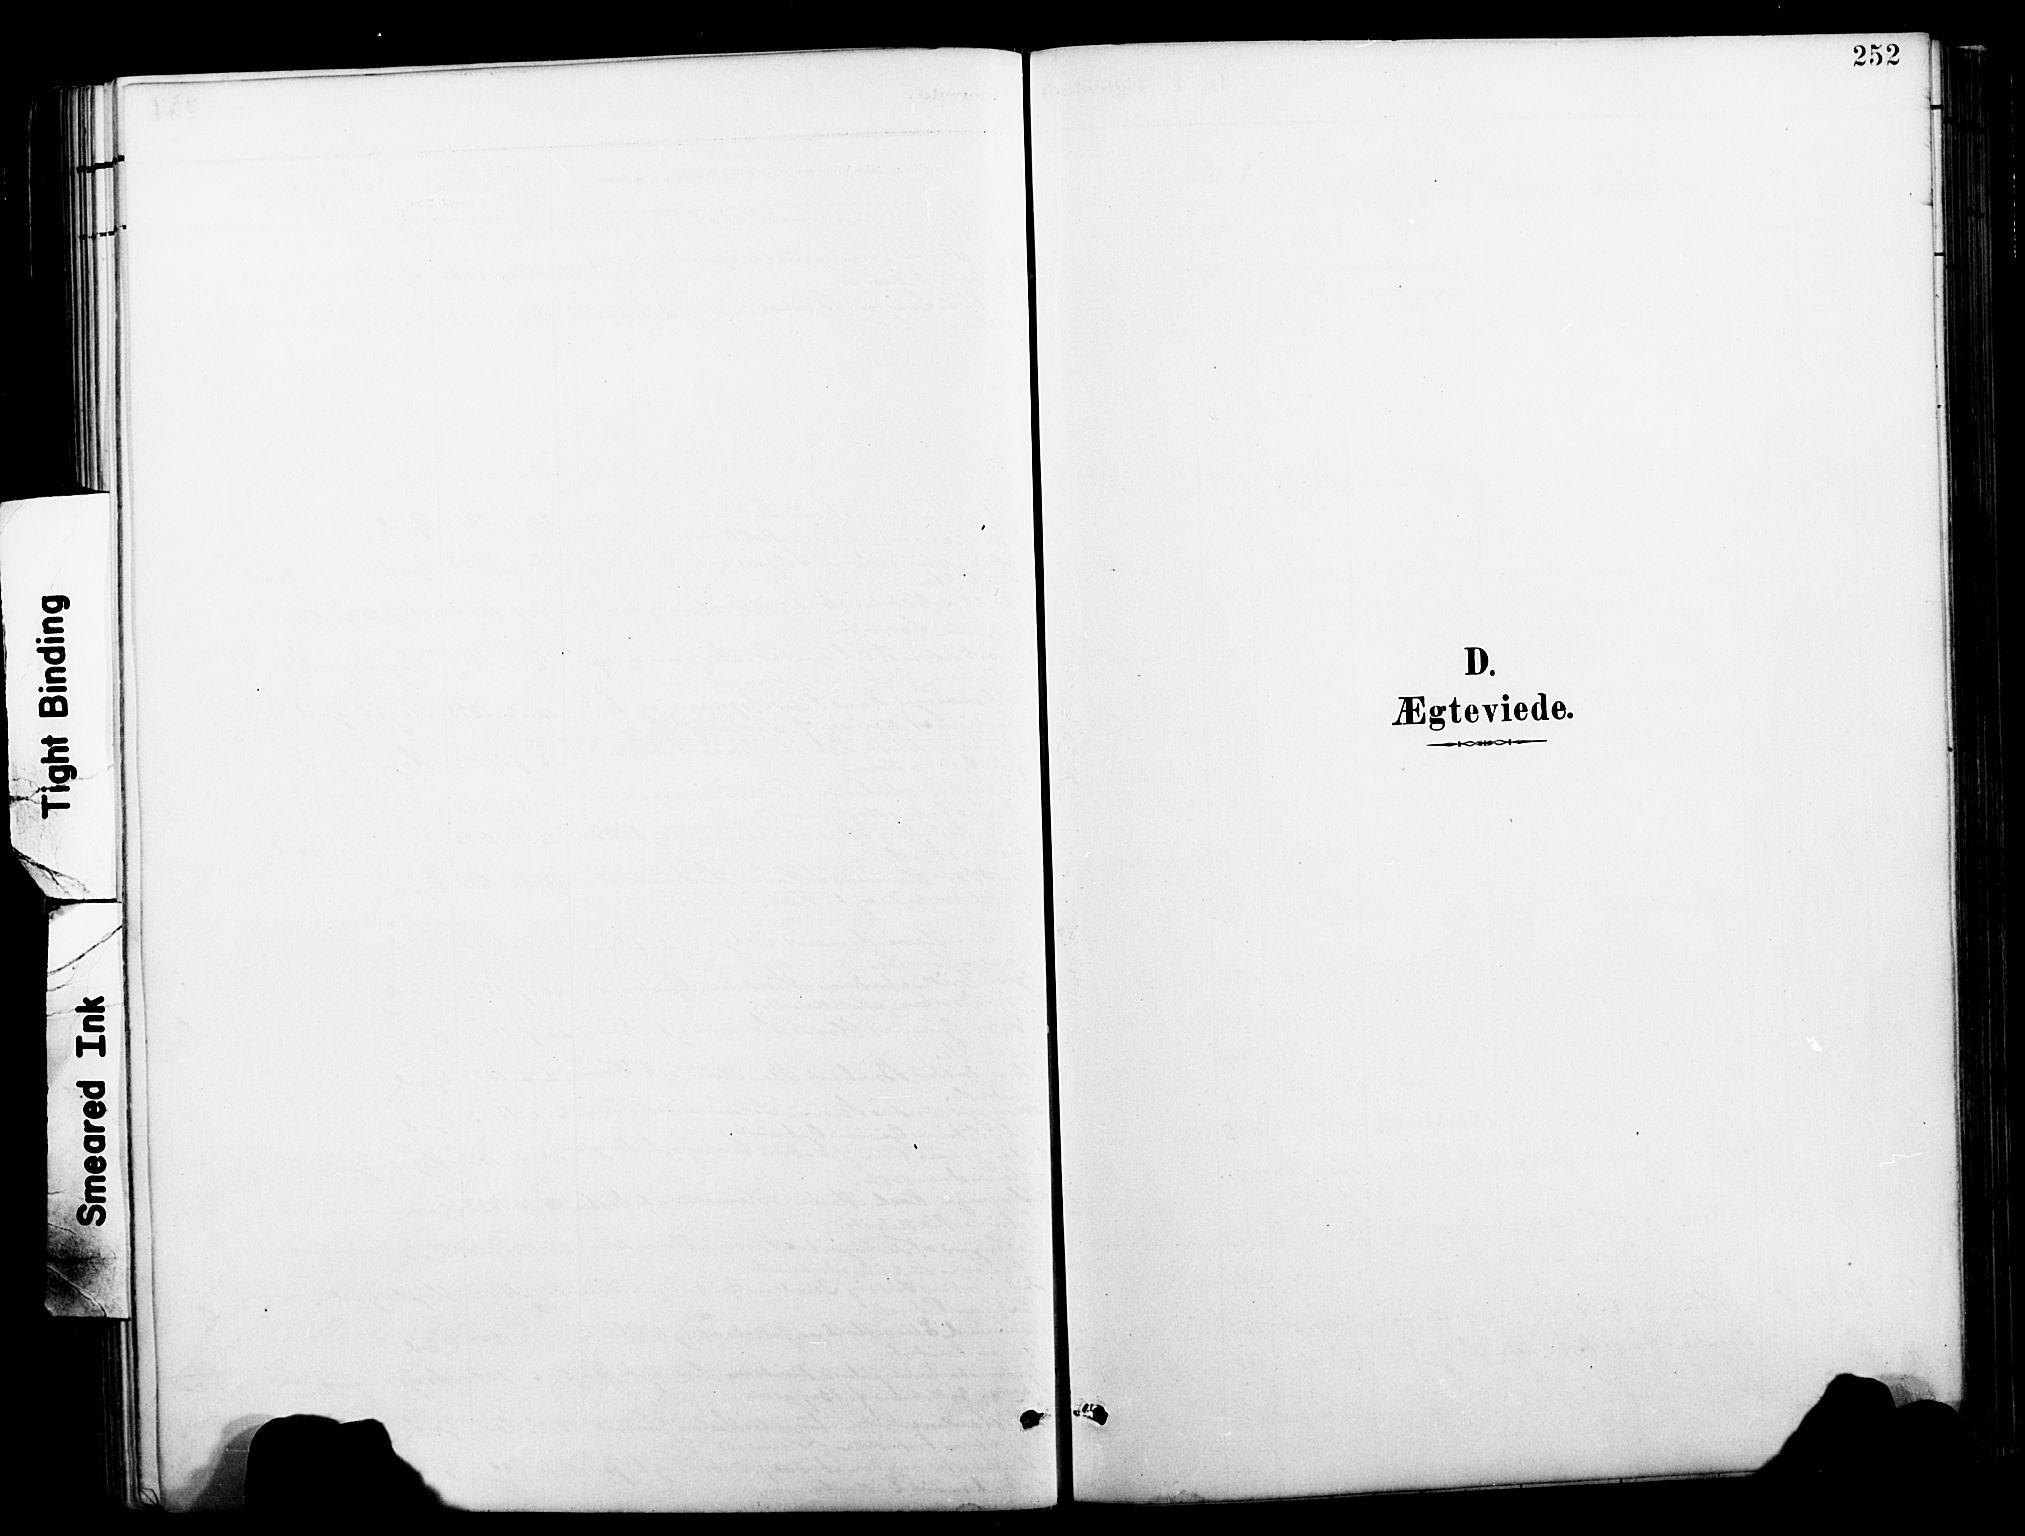 SAT, Ministerialprotokoller, klokkerbøker og fødselsregistre - Nordland, 827/L0421: Klokkerbok nr. 827C10, 1887-1906, s. 252